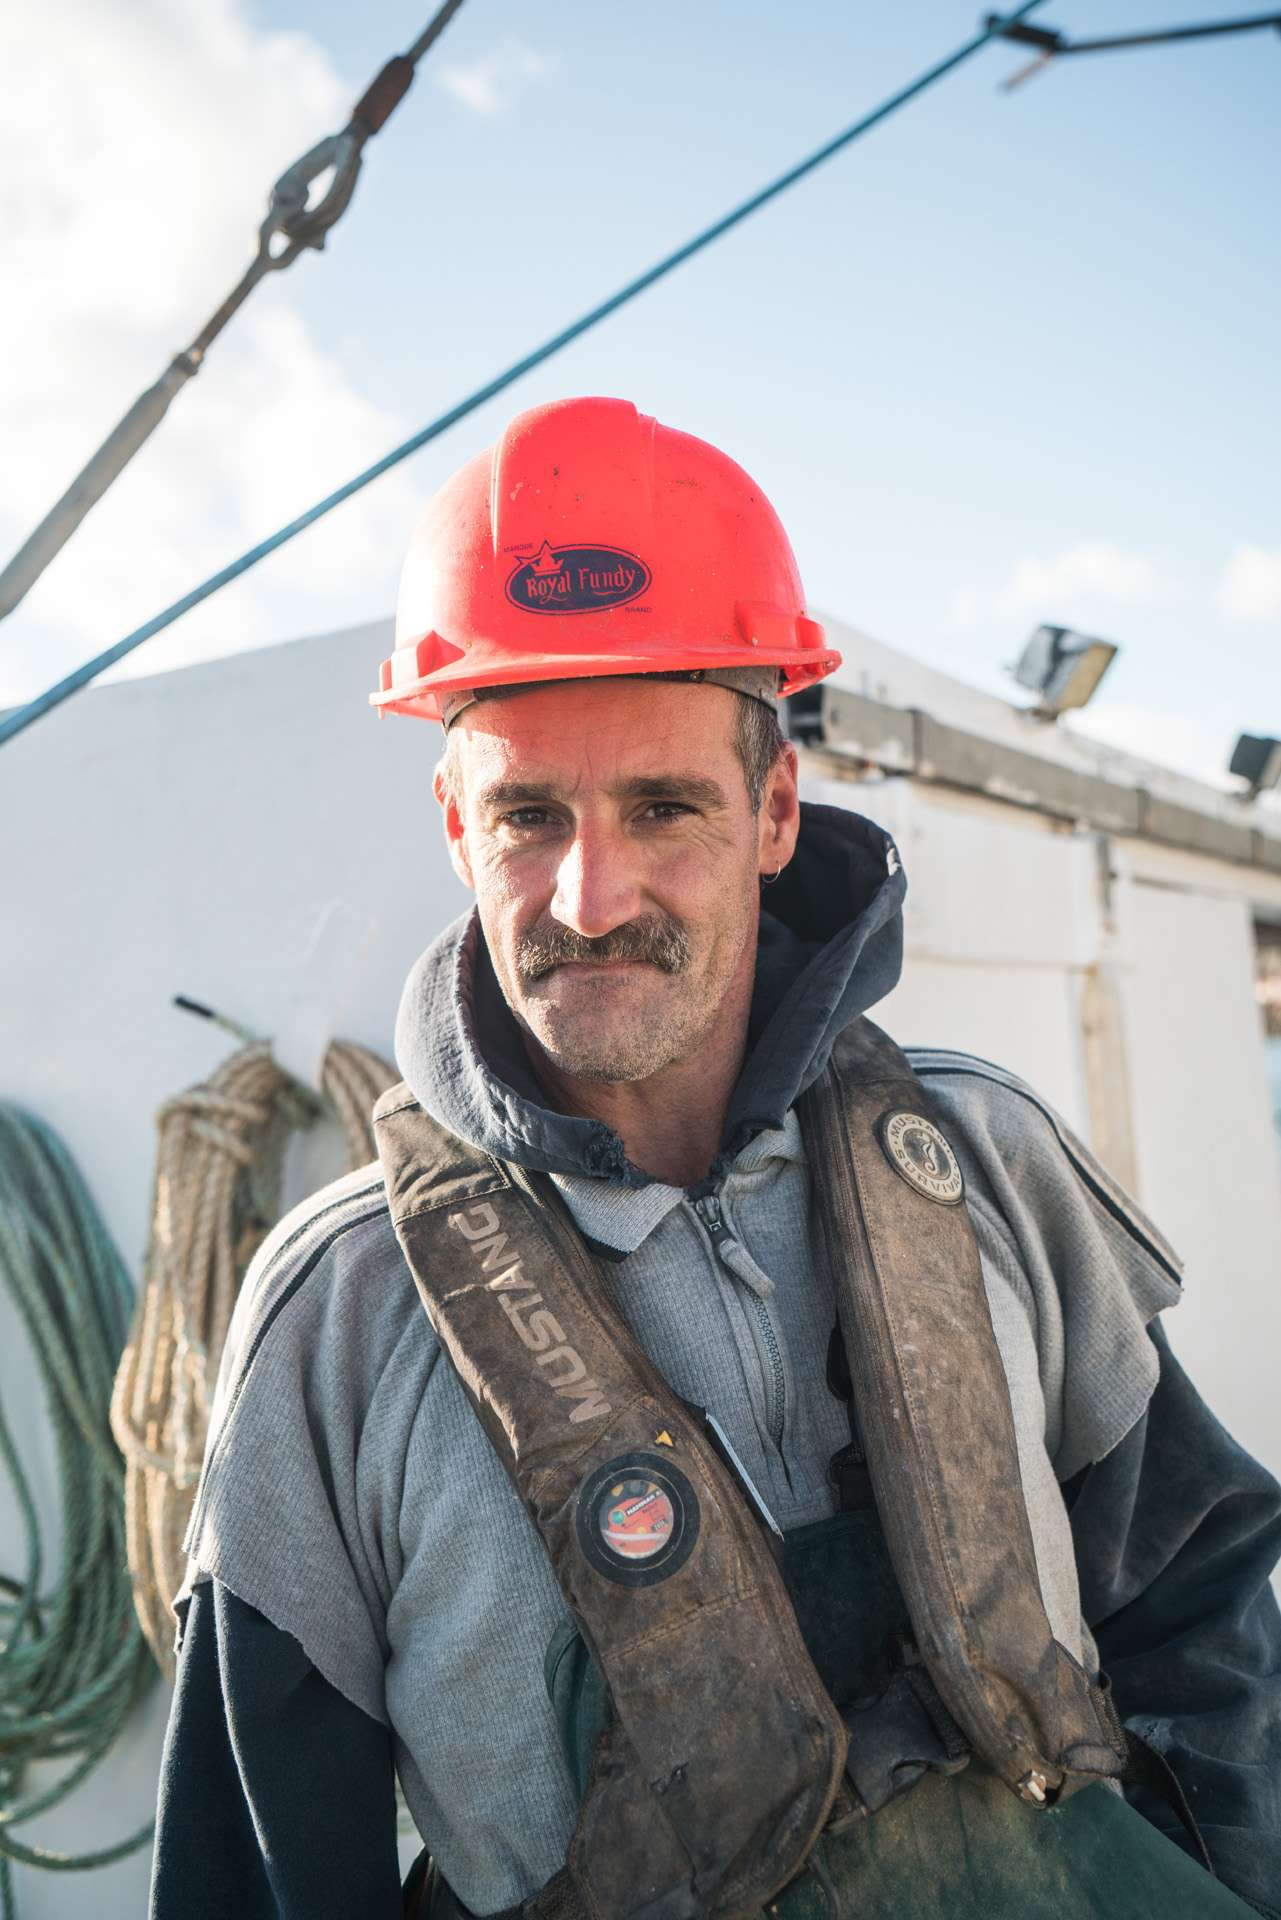 fisherman wearing red helmet smiling at camera by Bruno Florin for Ricardo Magazine